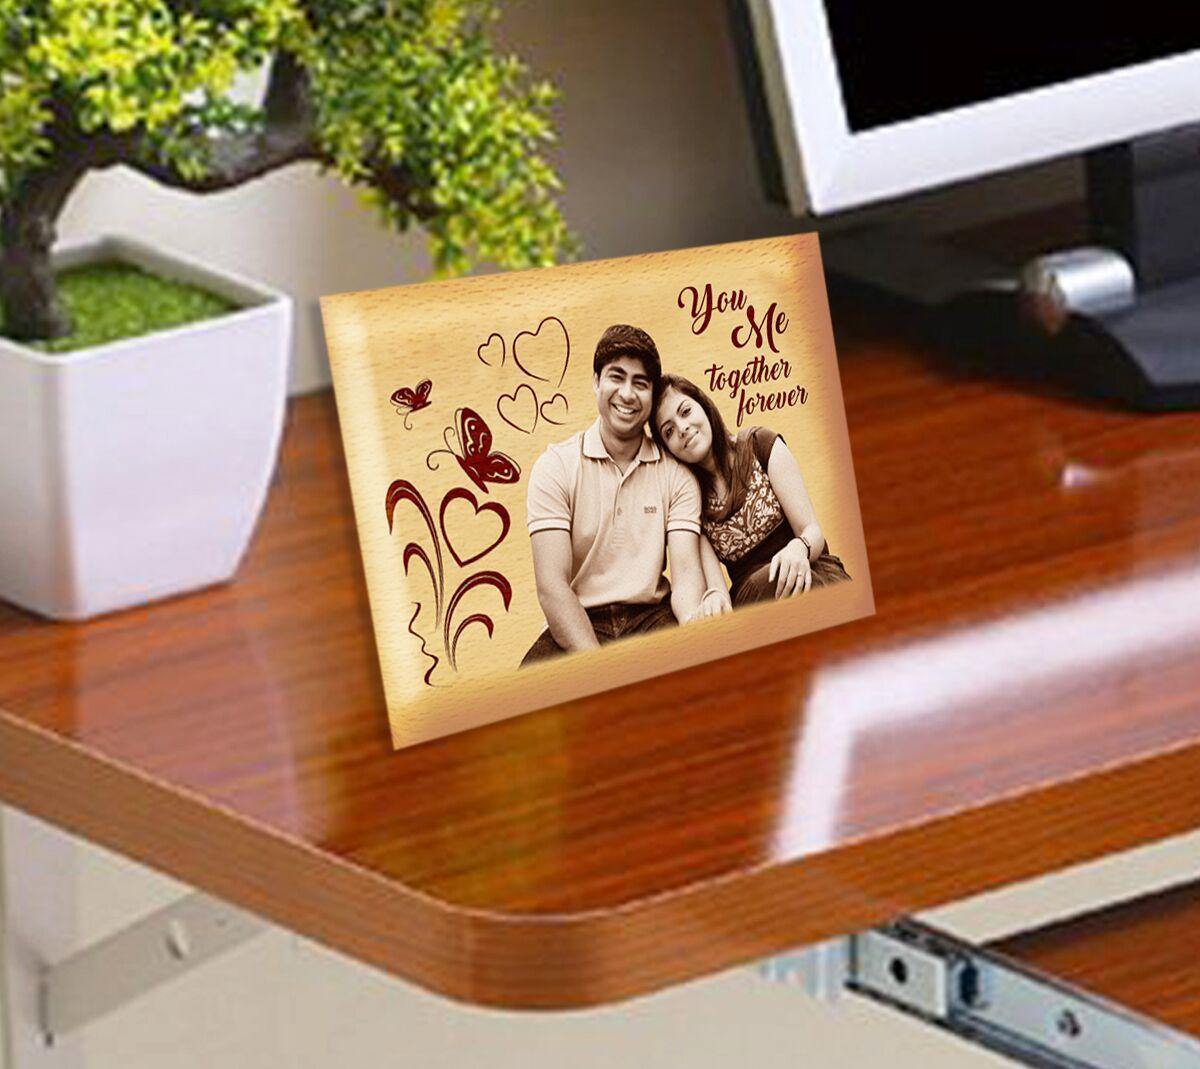 Buy Presto Gift For Boyfriend Or Girlfriend Love Gift Anniversary Gift BirtHDay Gift Valentine's